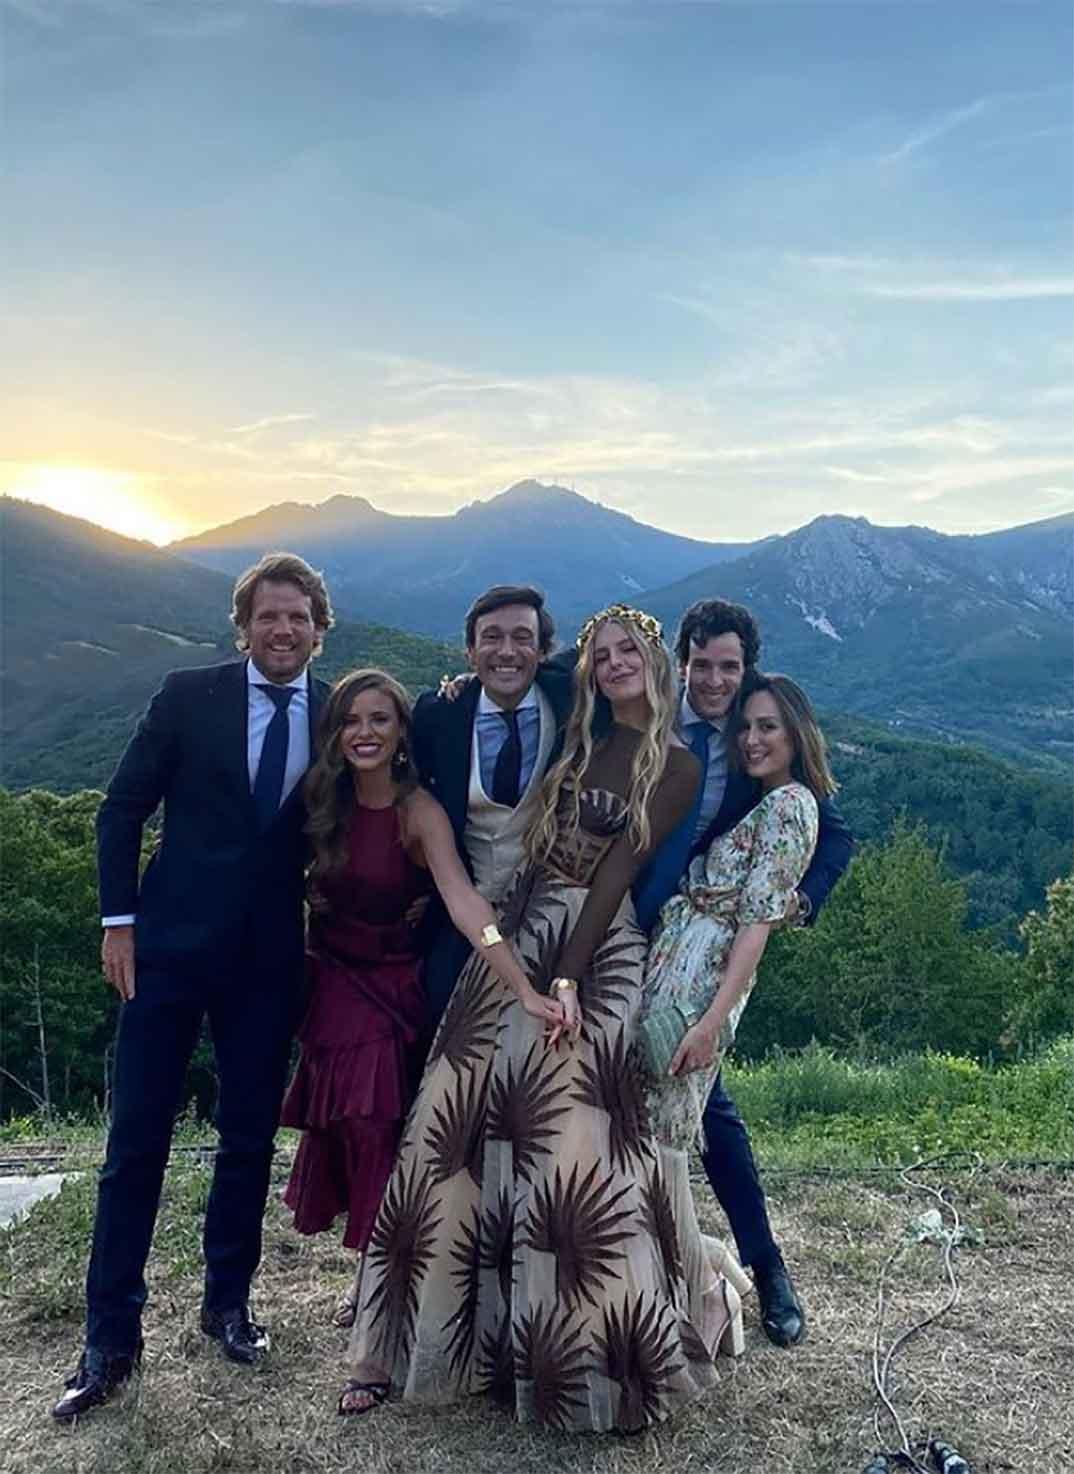 Tamara Falcó e Íñigo Onieva con sus amigos © Instagram